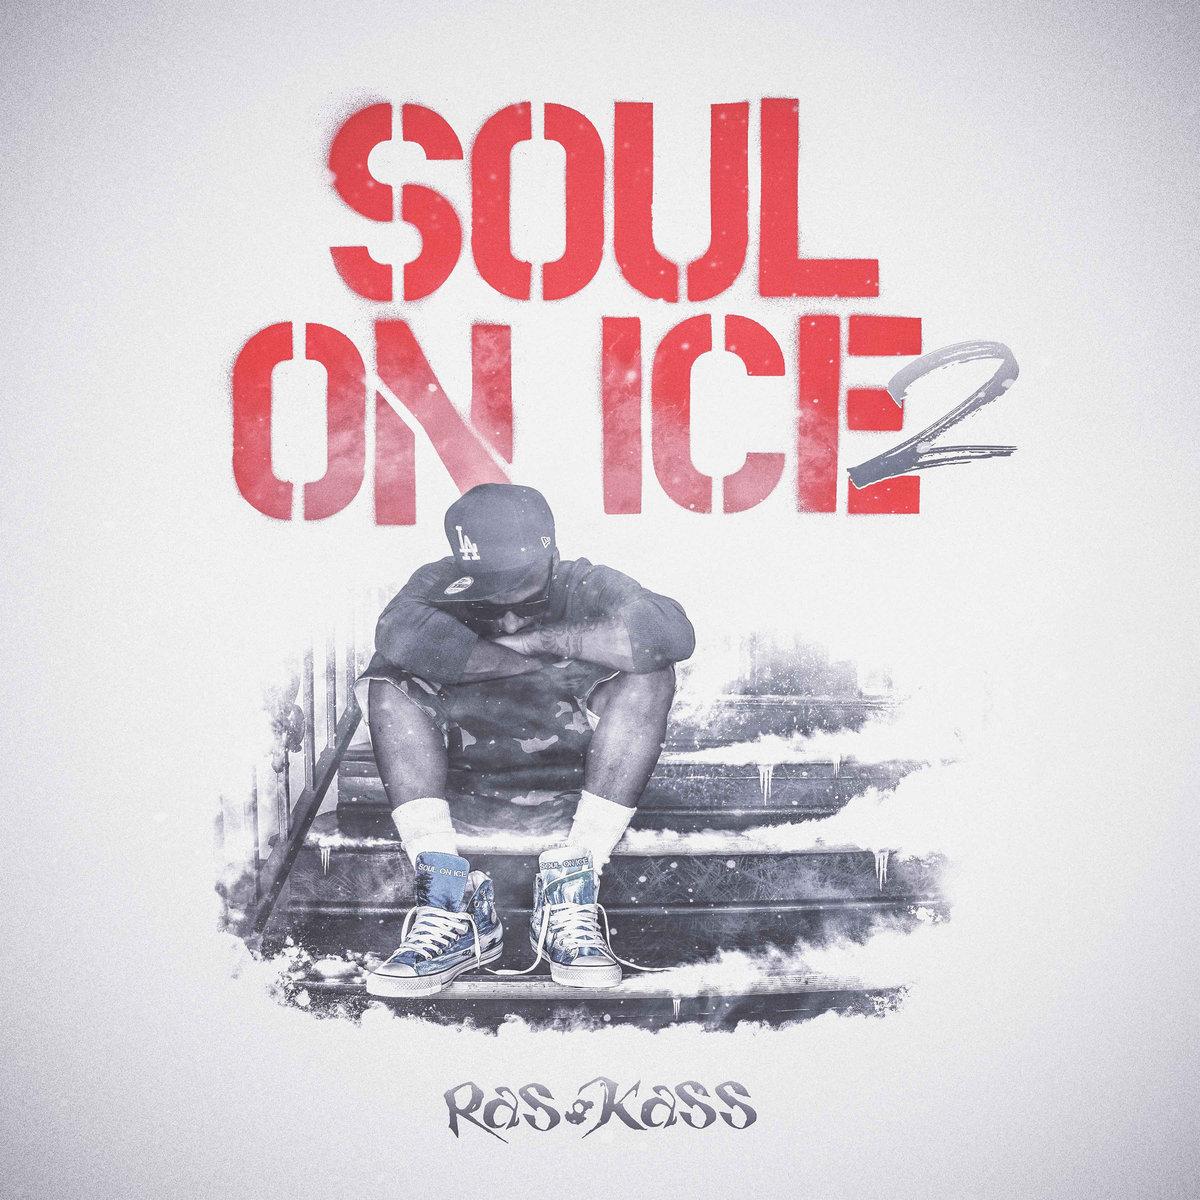 Ras Kass — «Guns N Roses» (feat. Styles P & Lil Fame)